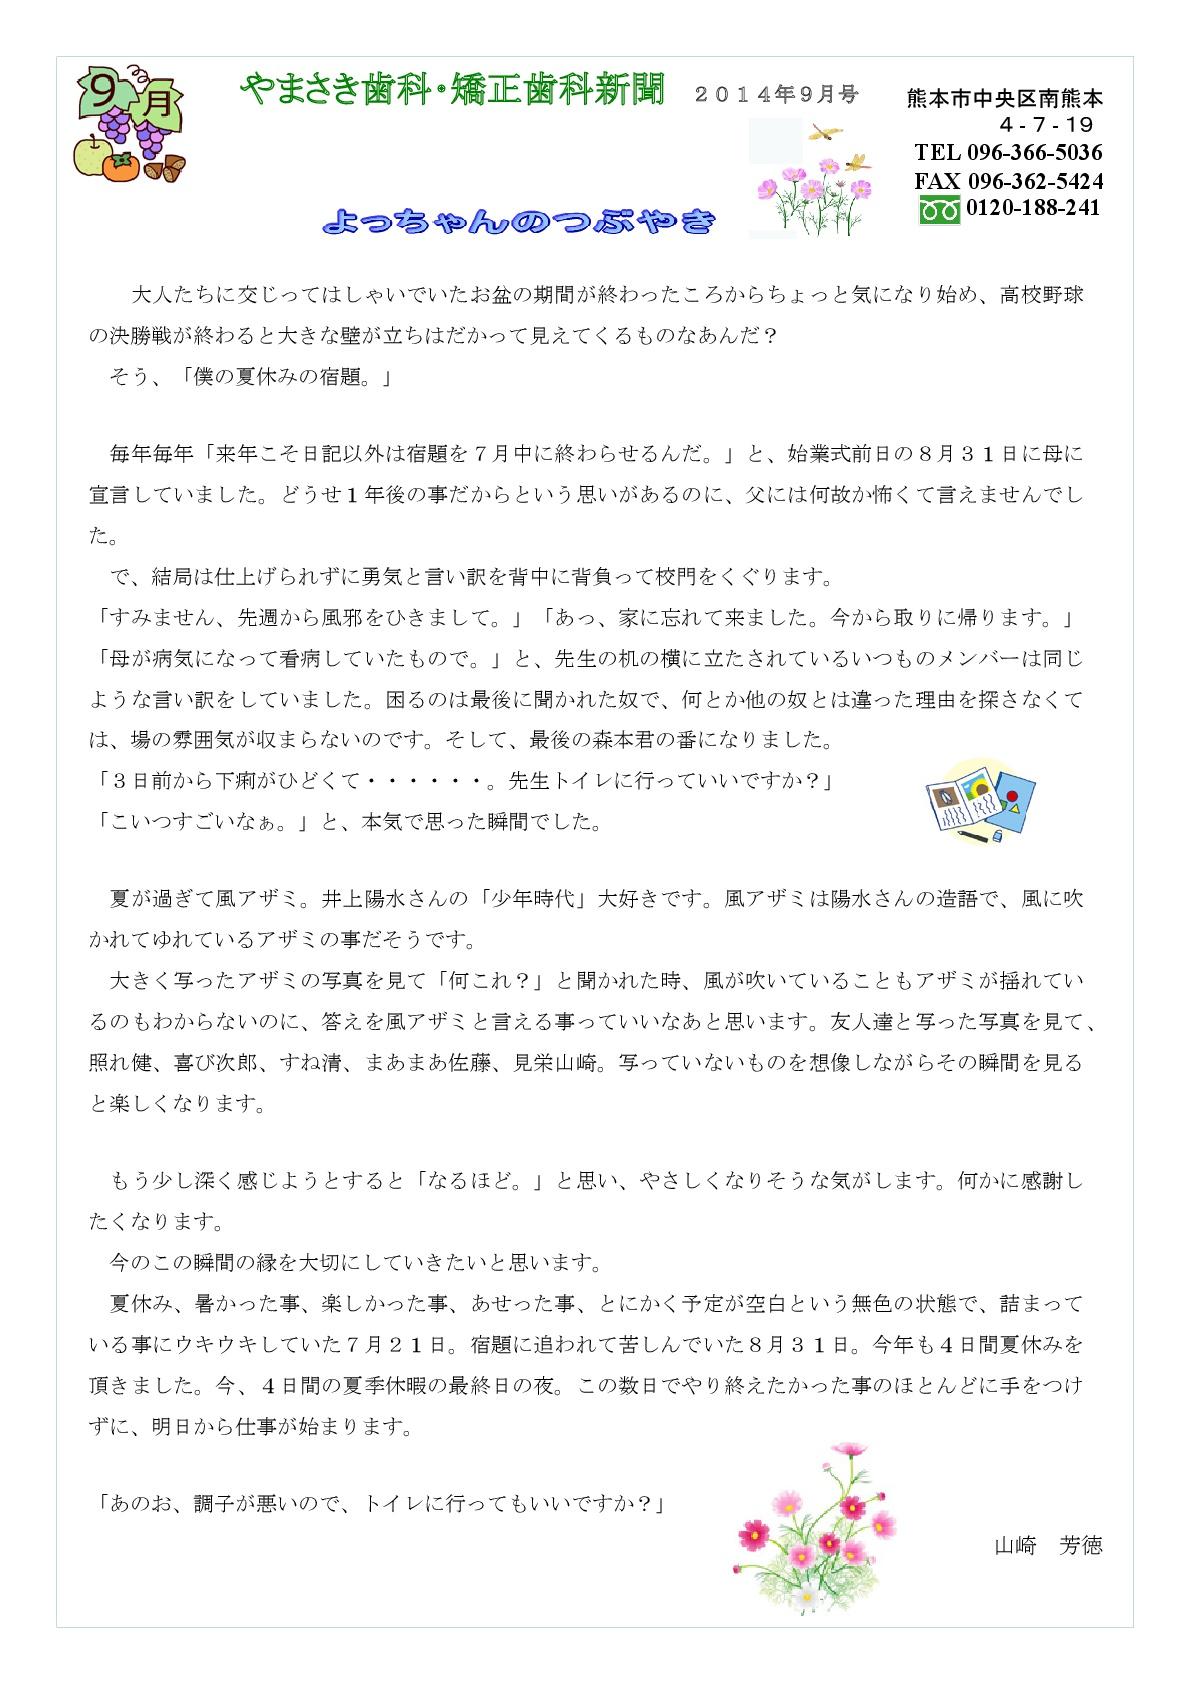 sinbun14-9-1-001